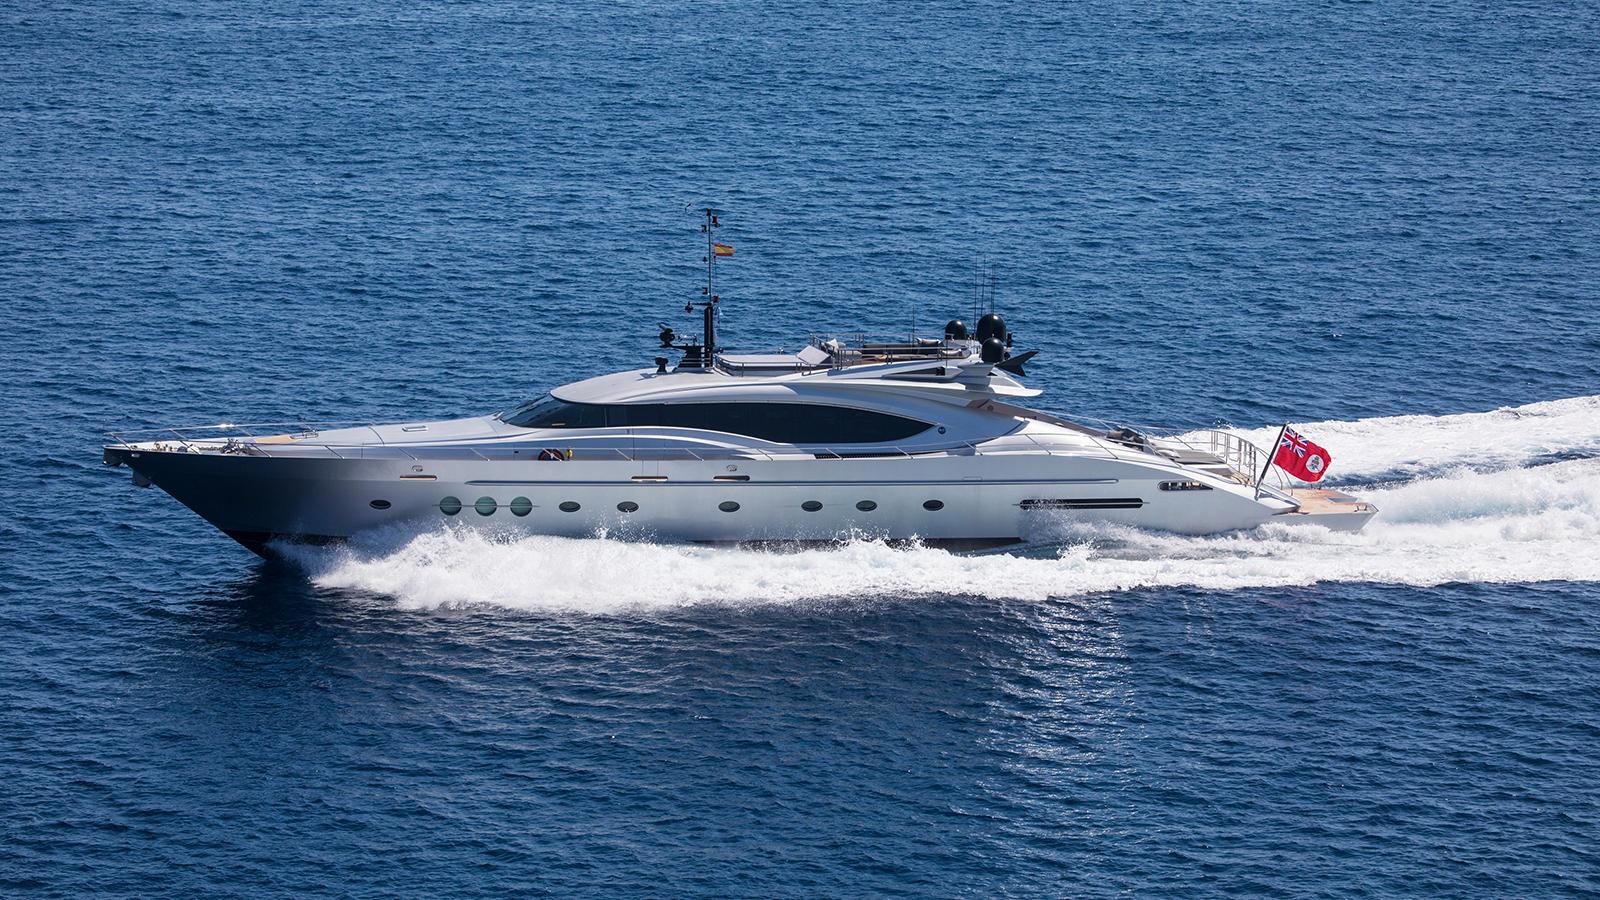 the-palmer-johnson-motor-yacht-hush-has-been-sold